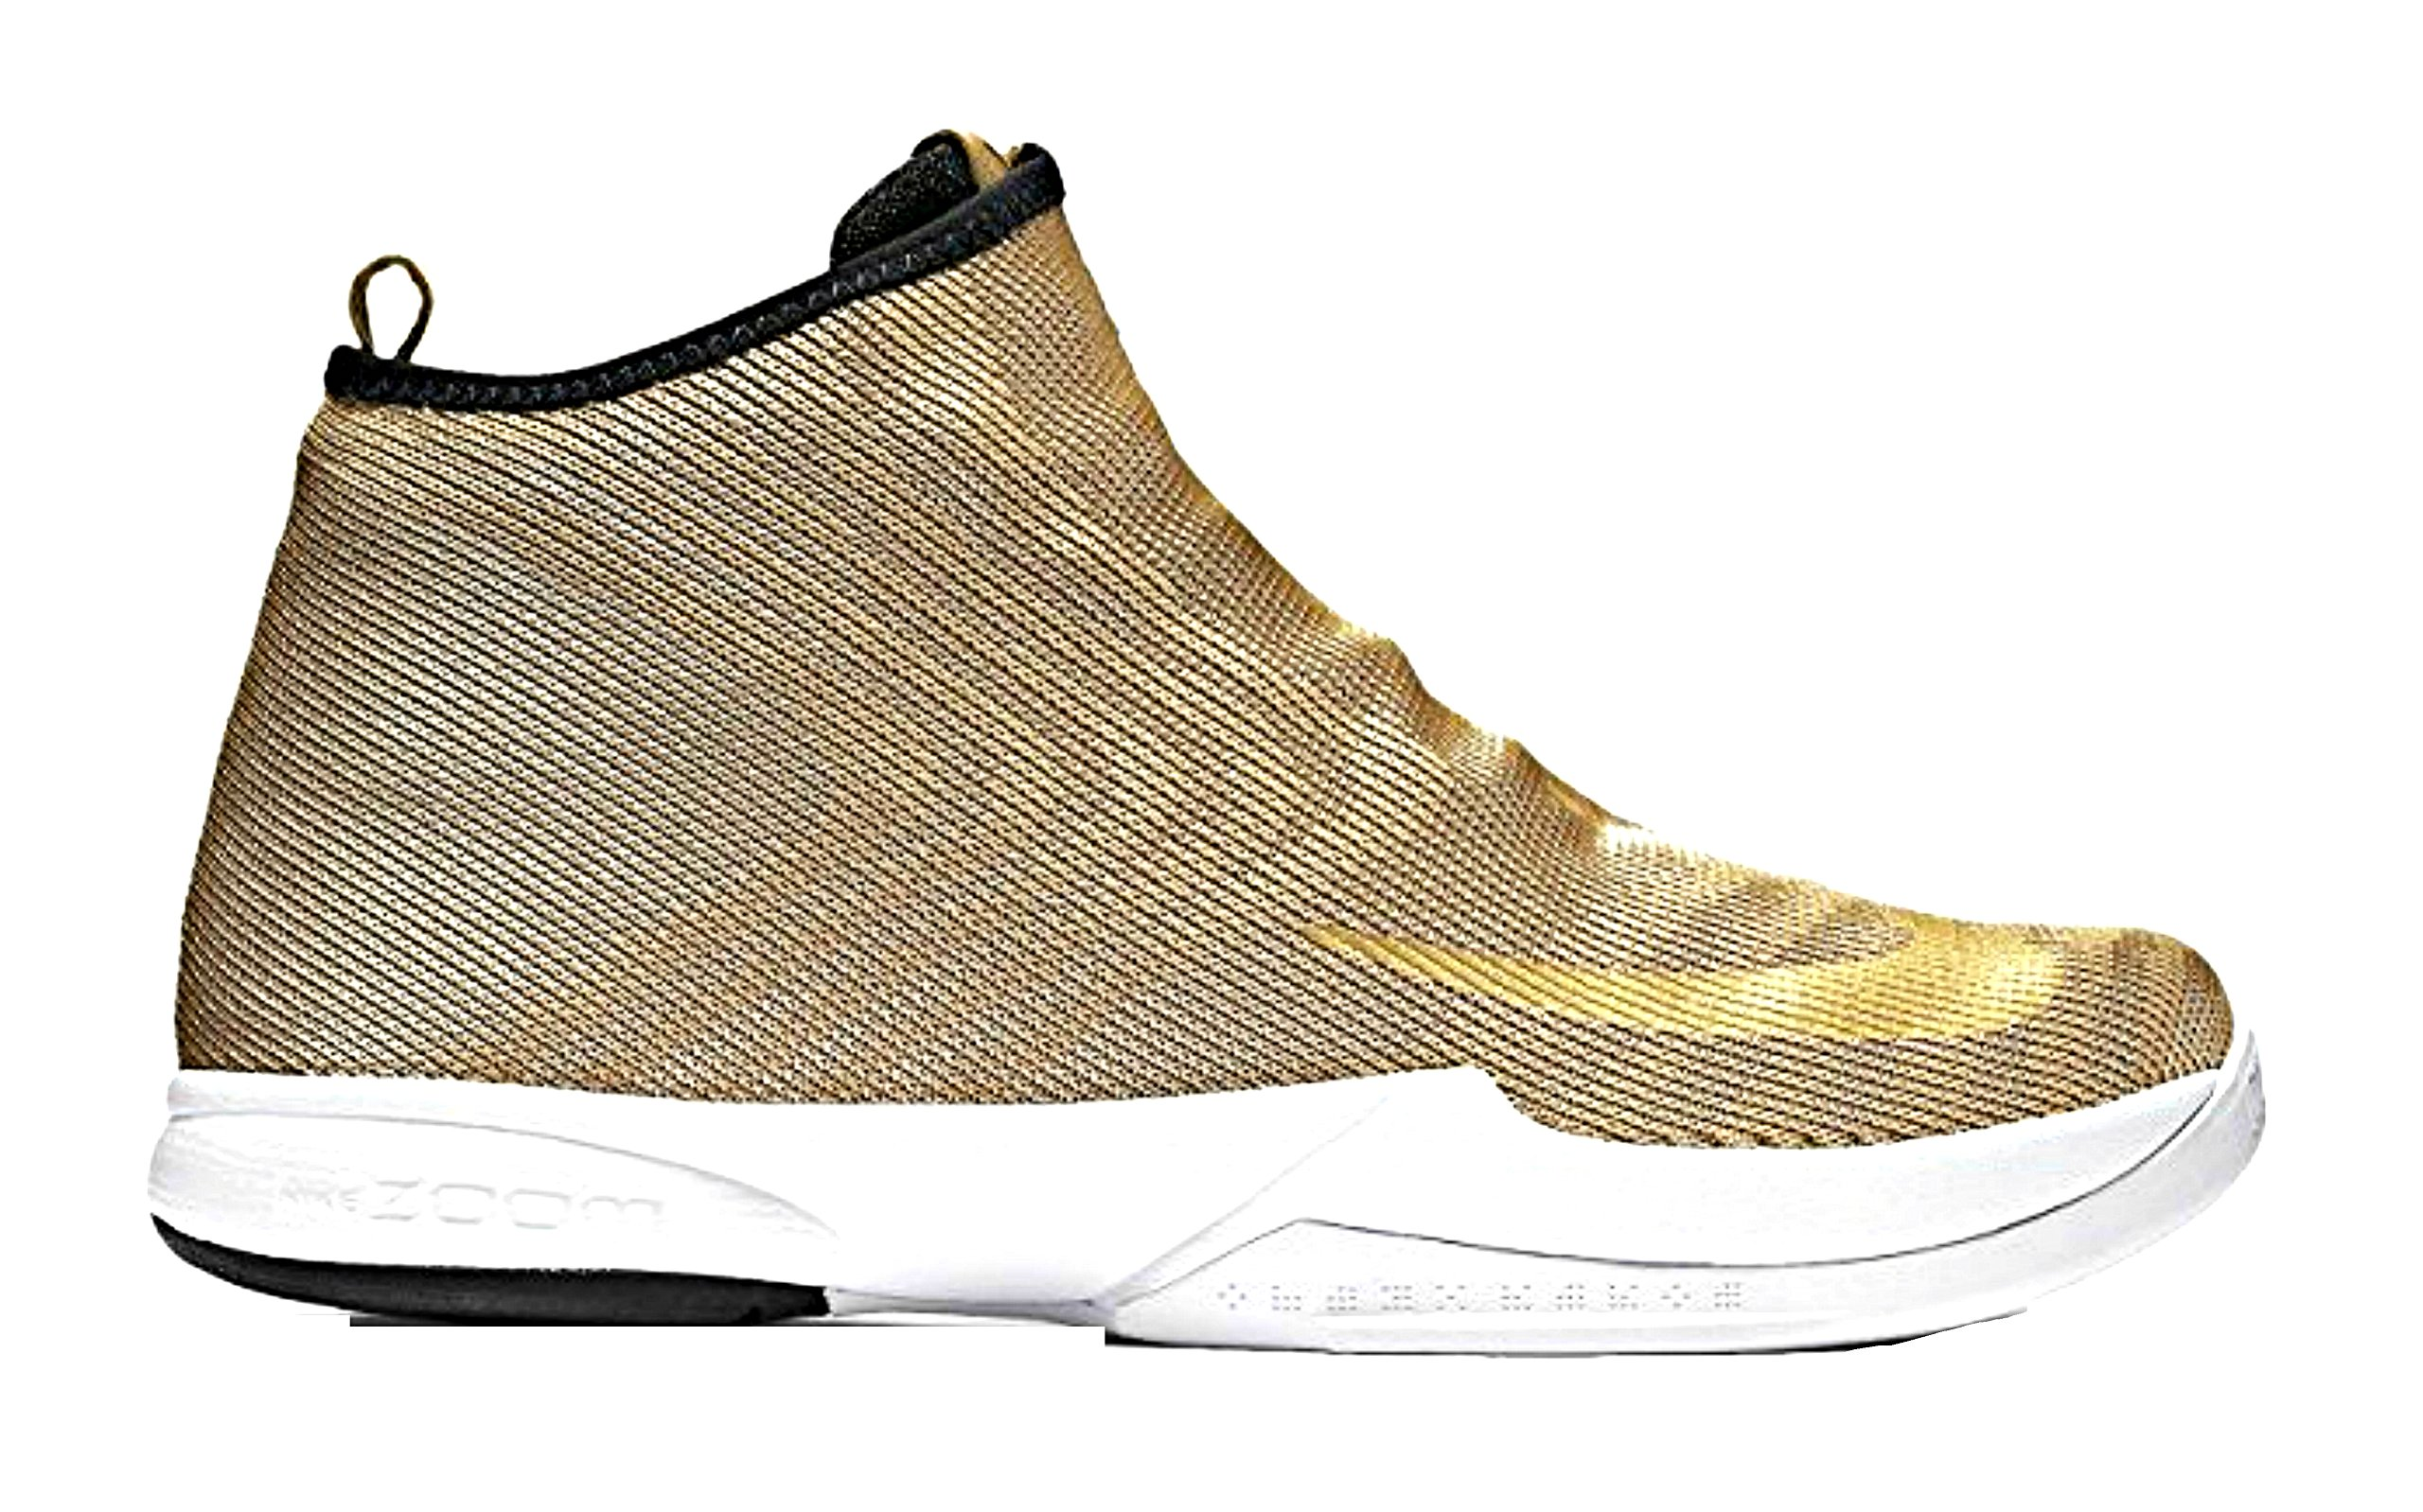 NIKE Zoom Kobe Icon JCRD Men Lifestyle Casual Sneakers New Metallic Gold (9)